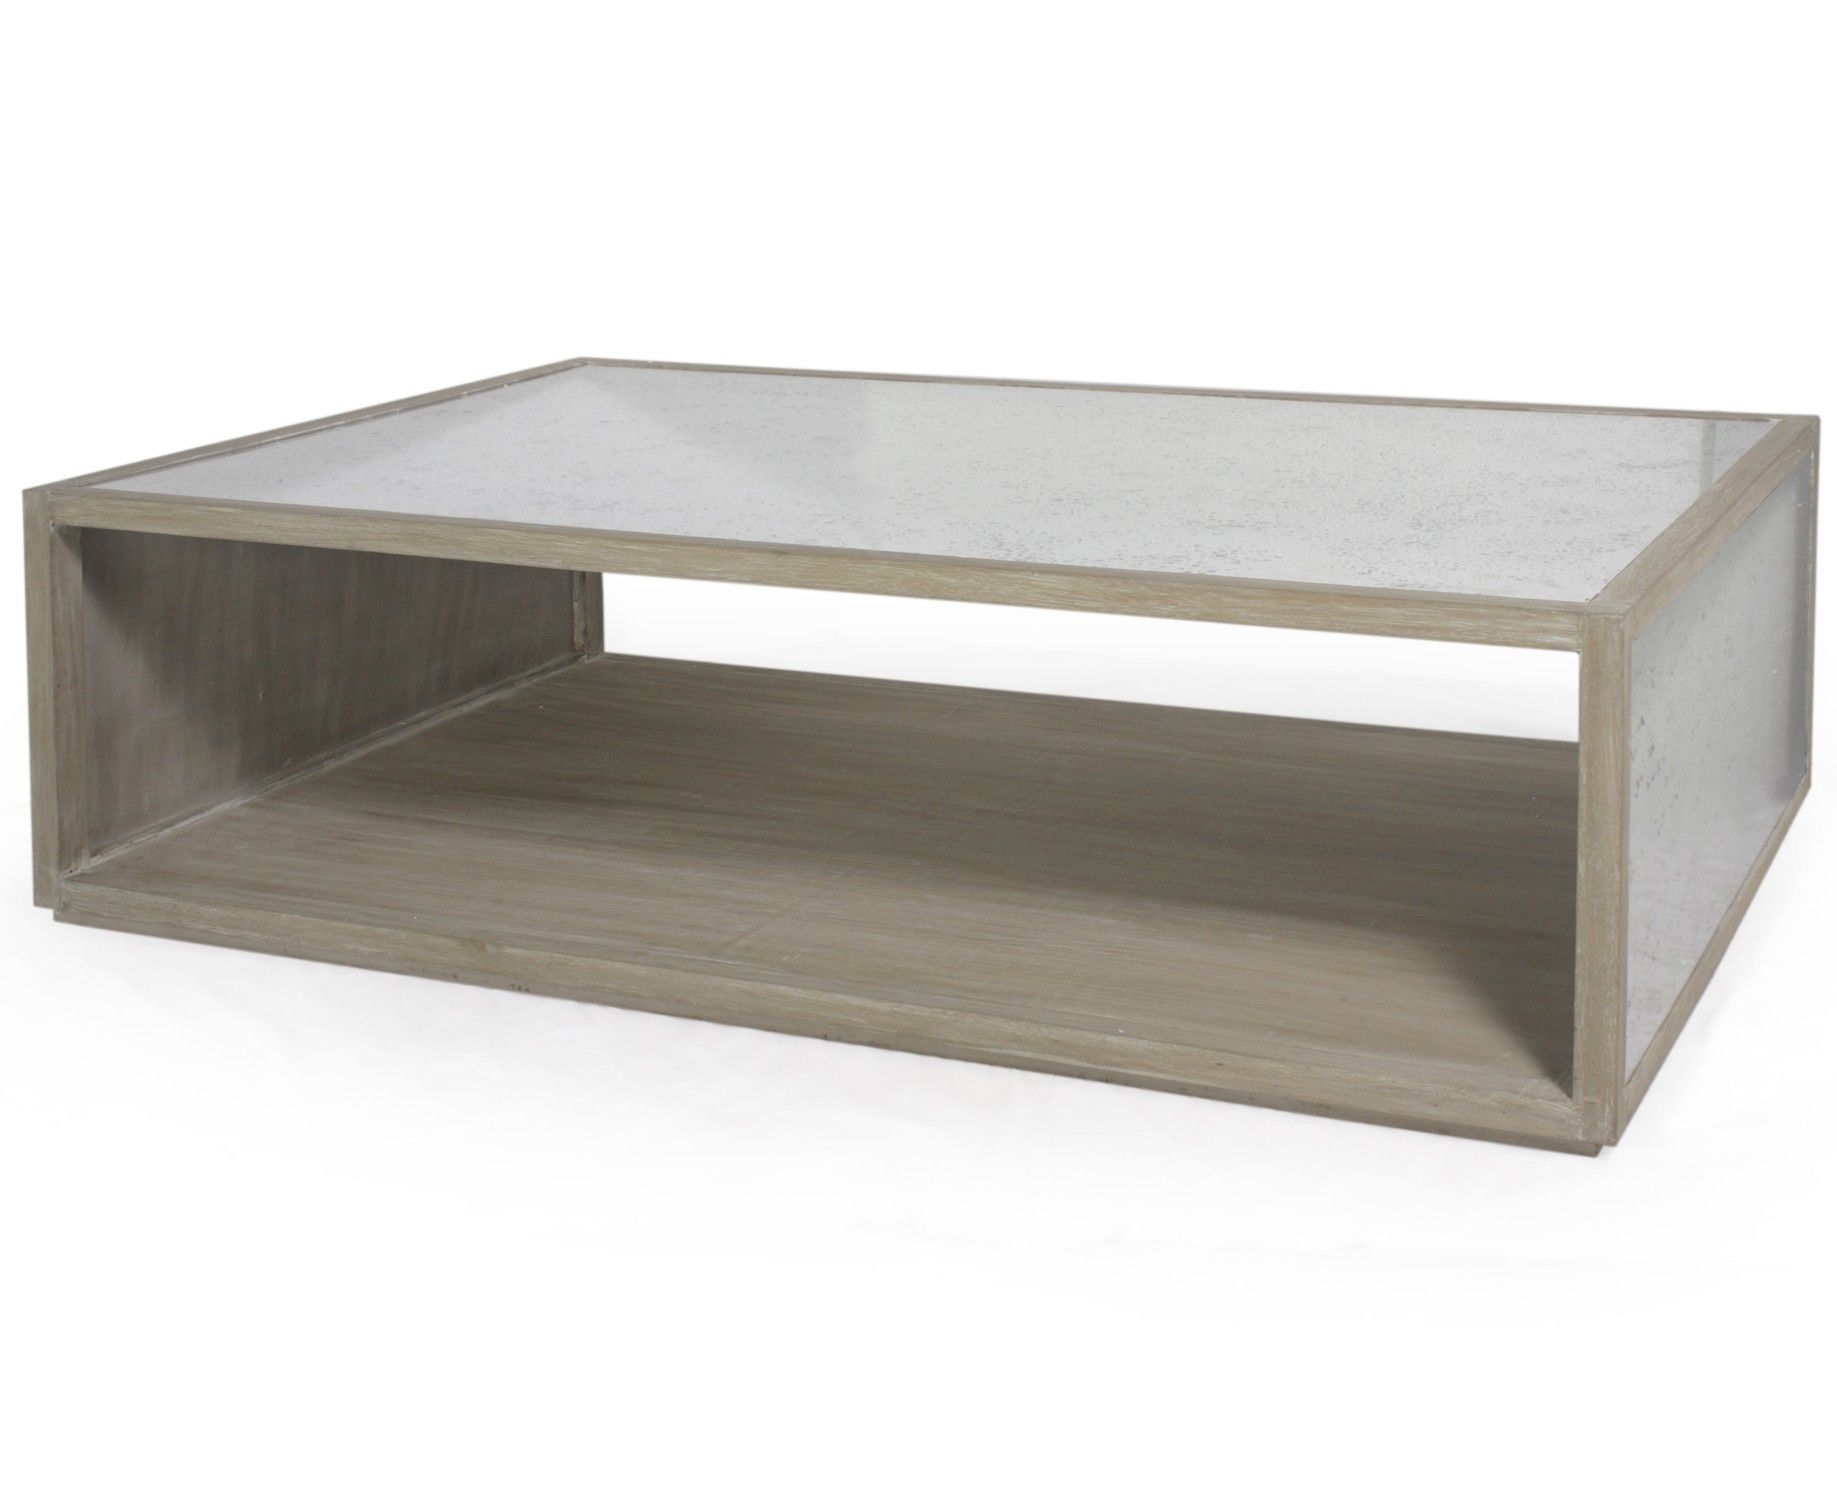 V1 Derek Ct Coffee Table Minimalist Coffee Table Mirrored Coffee Tables [ 1497 x 1837 Pixel ]